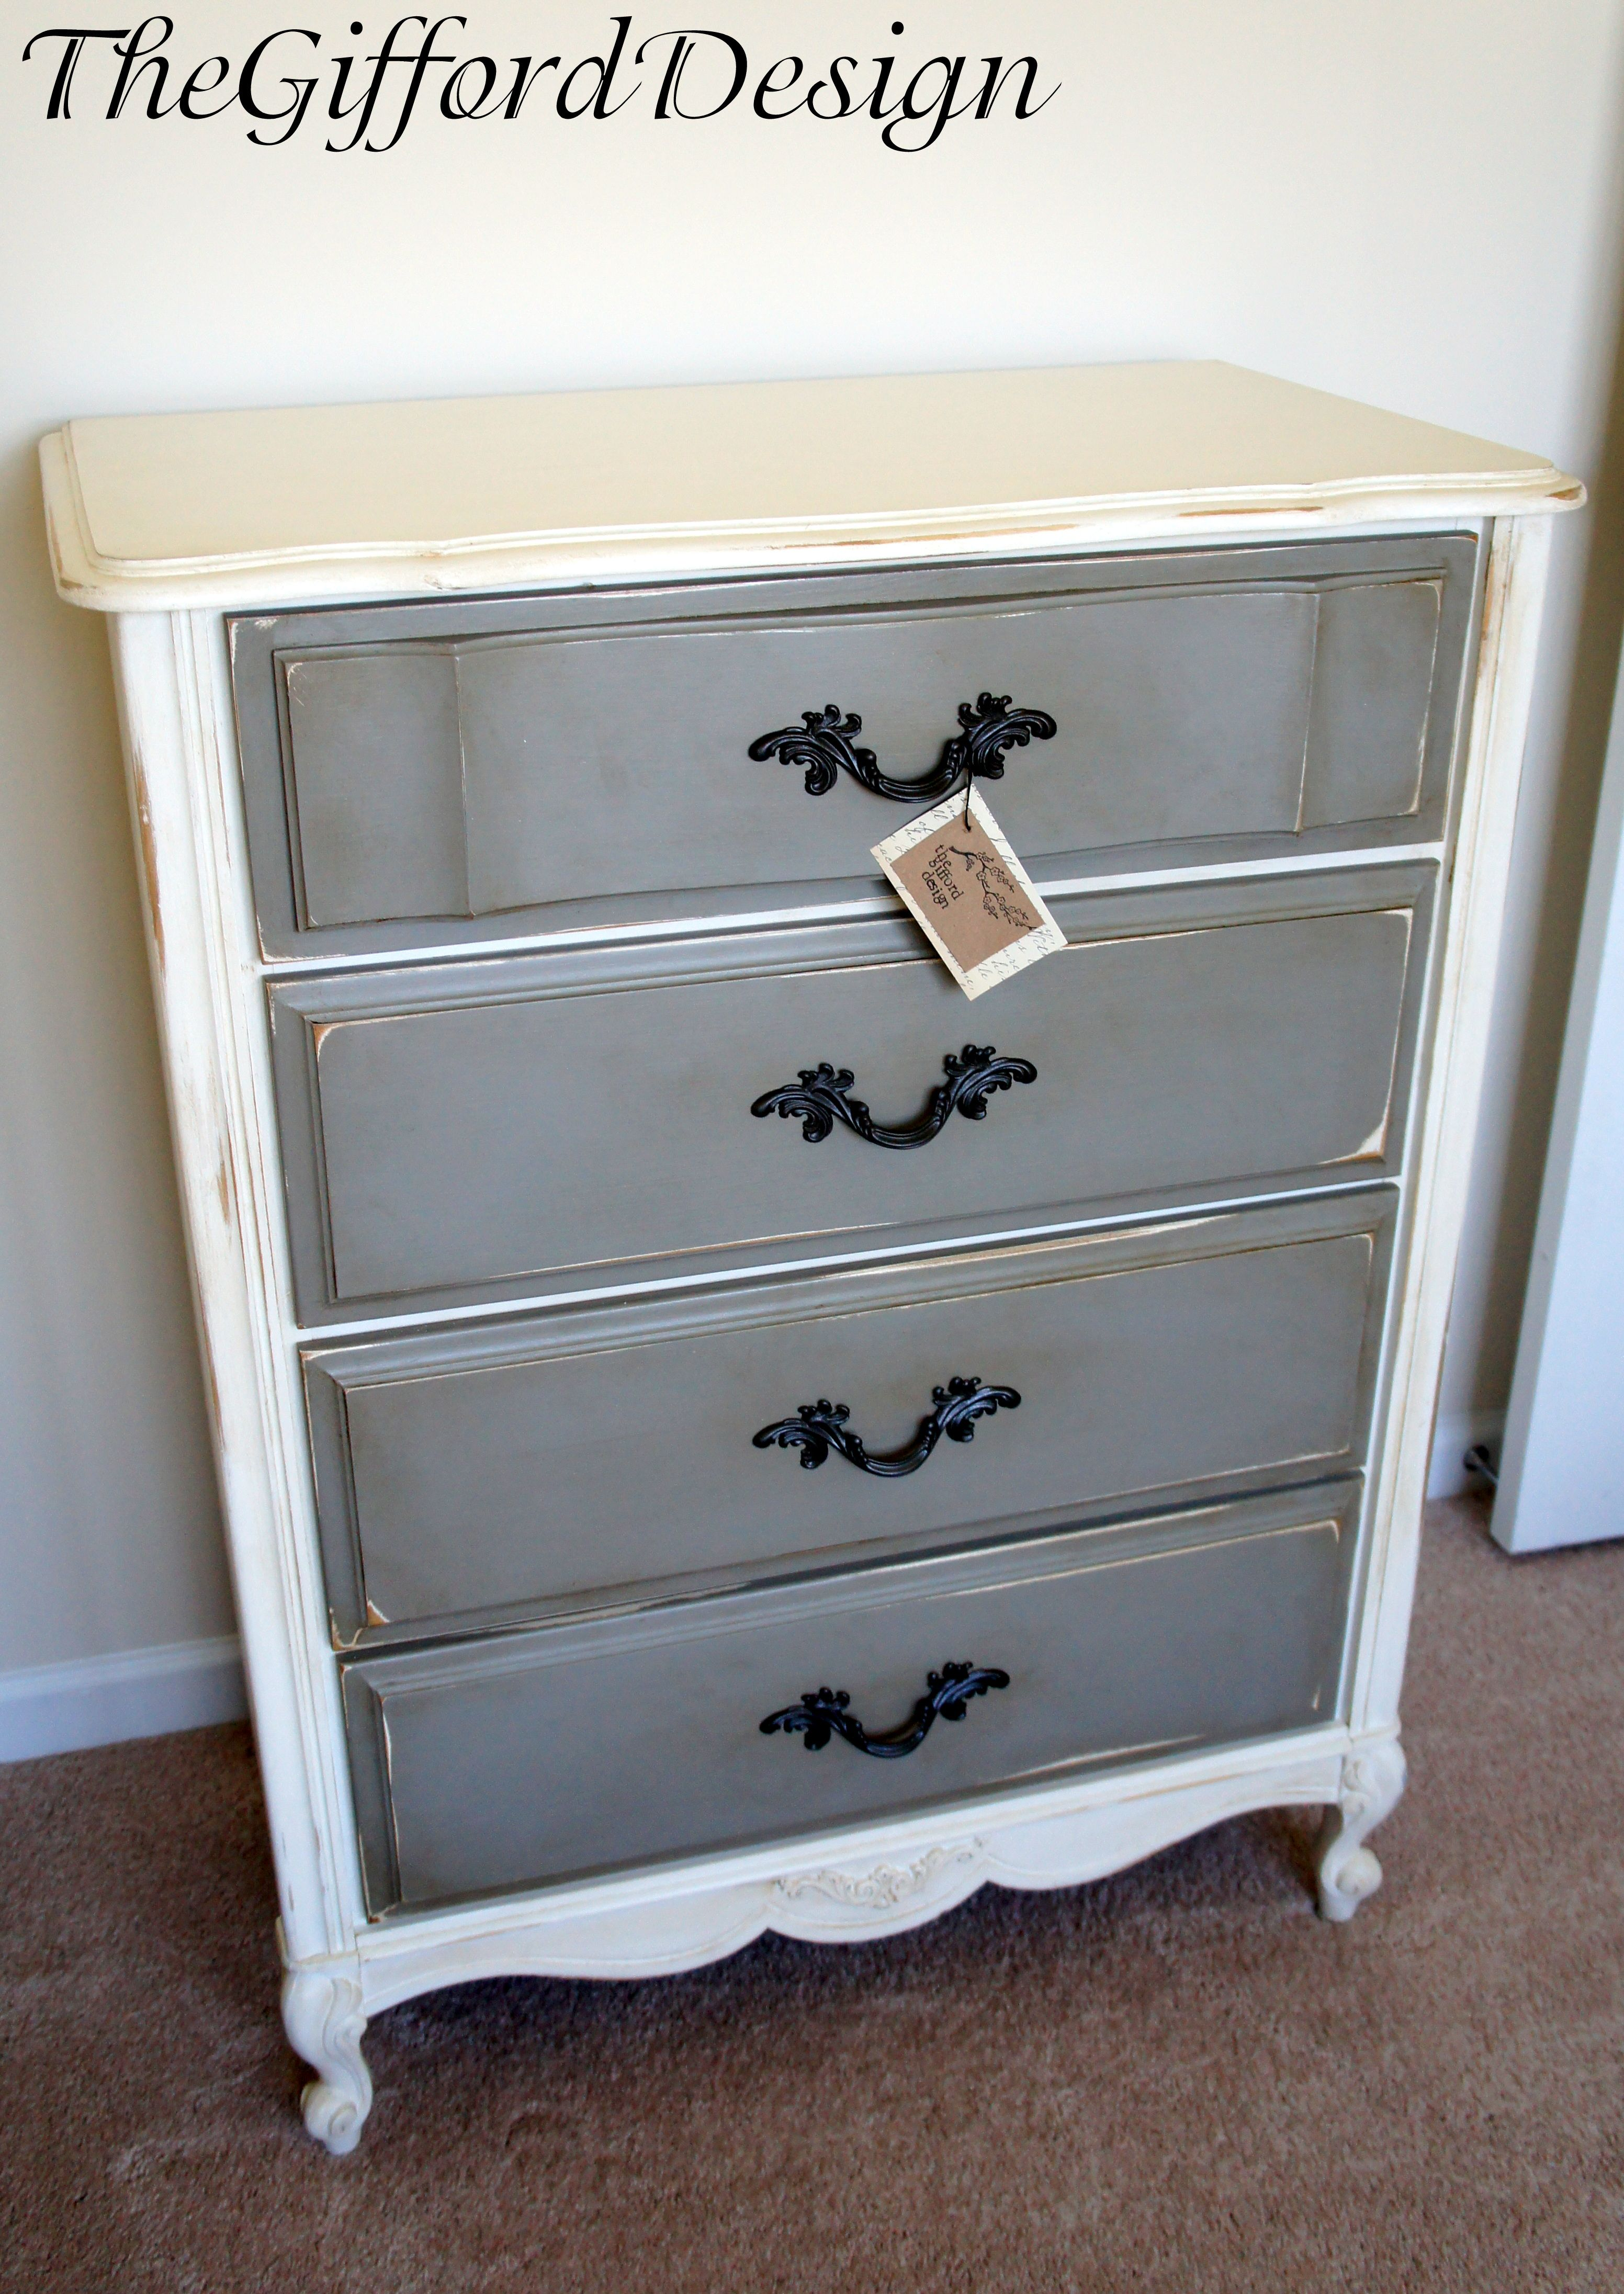 C moda blanca gris chalk paint pinterest c moda blanca c moda y gris - Comoda blanca ...